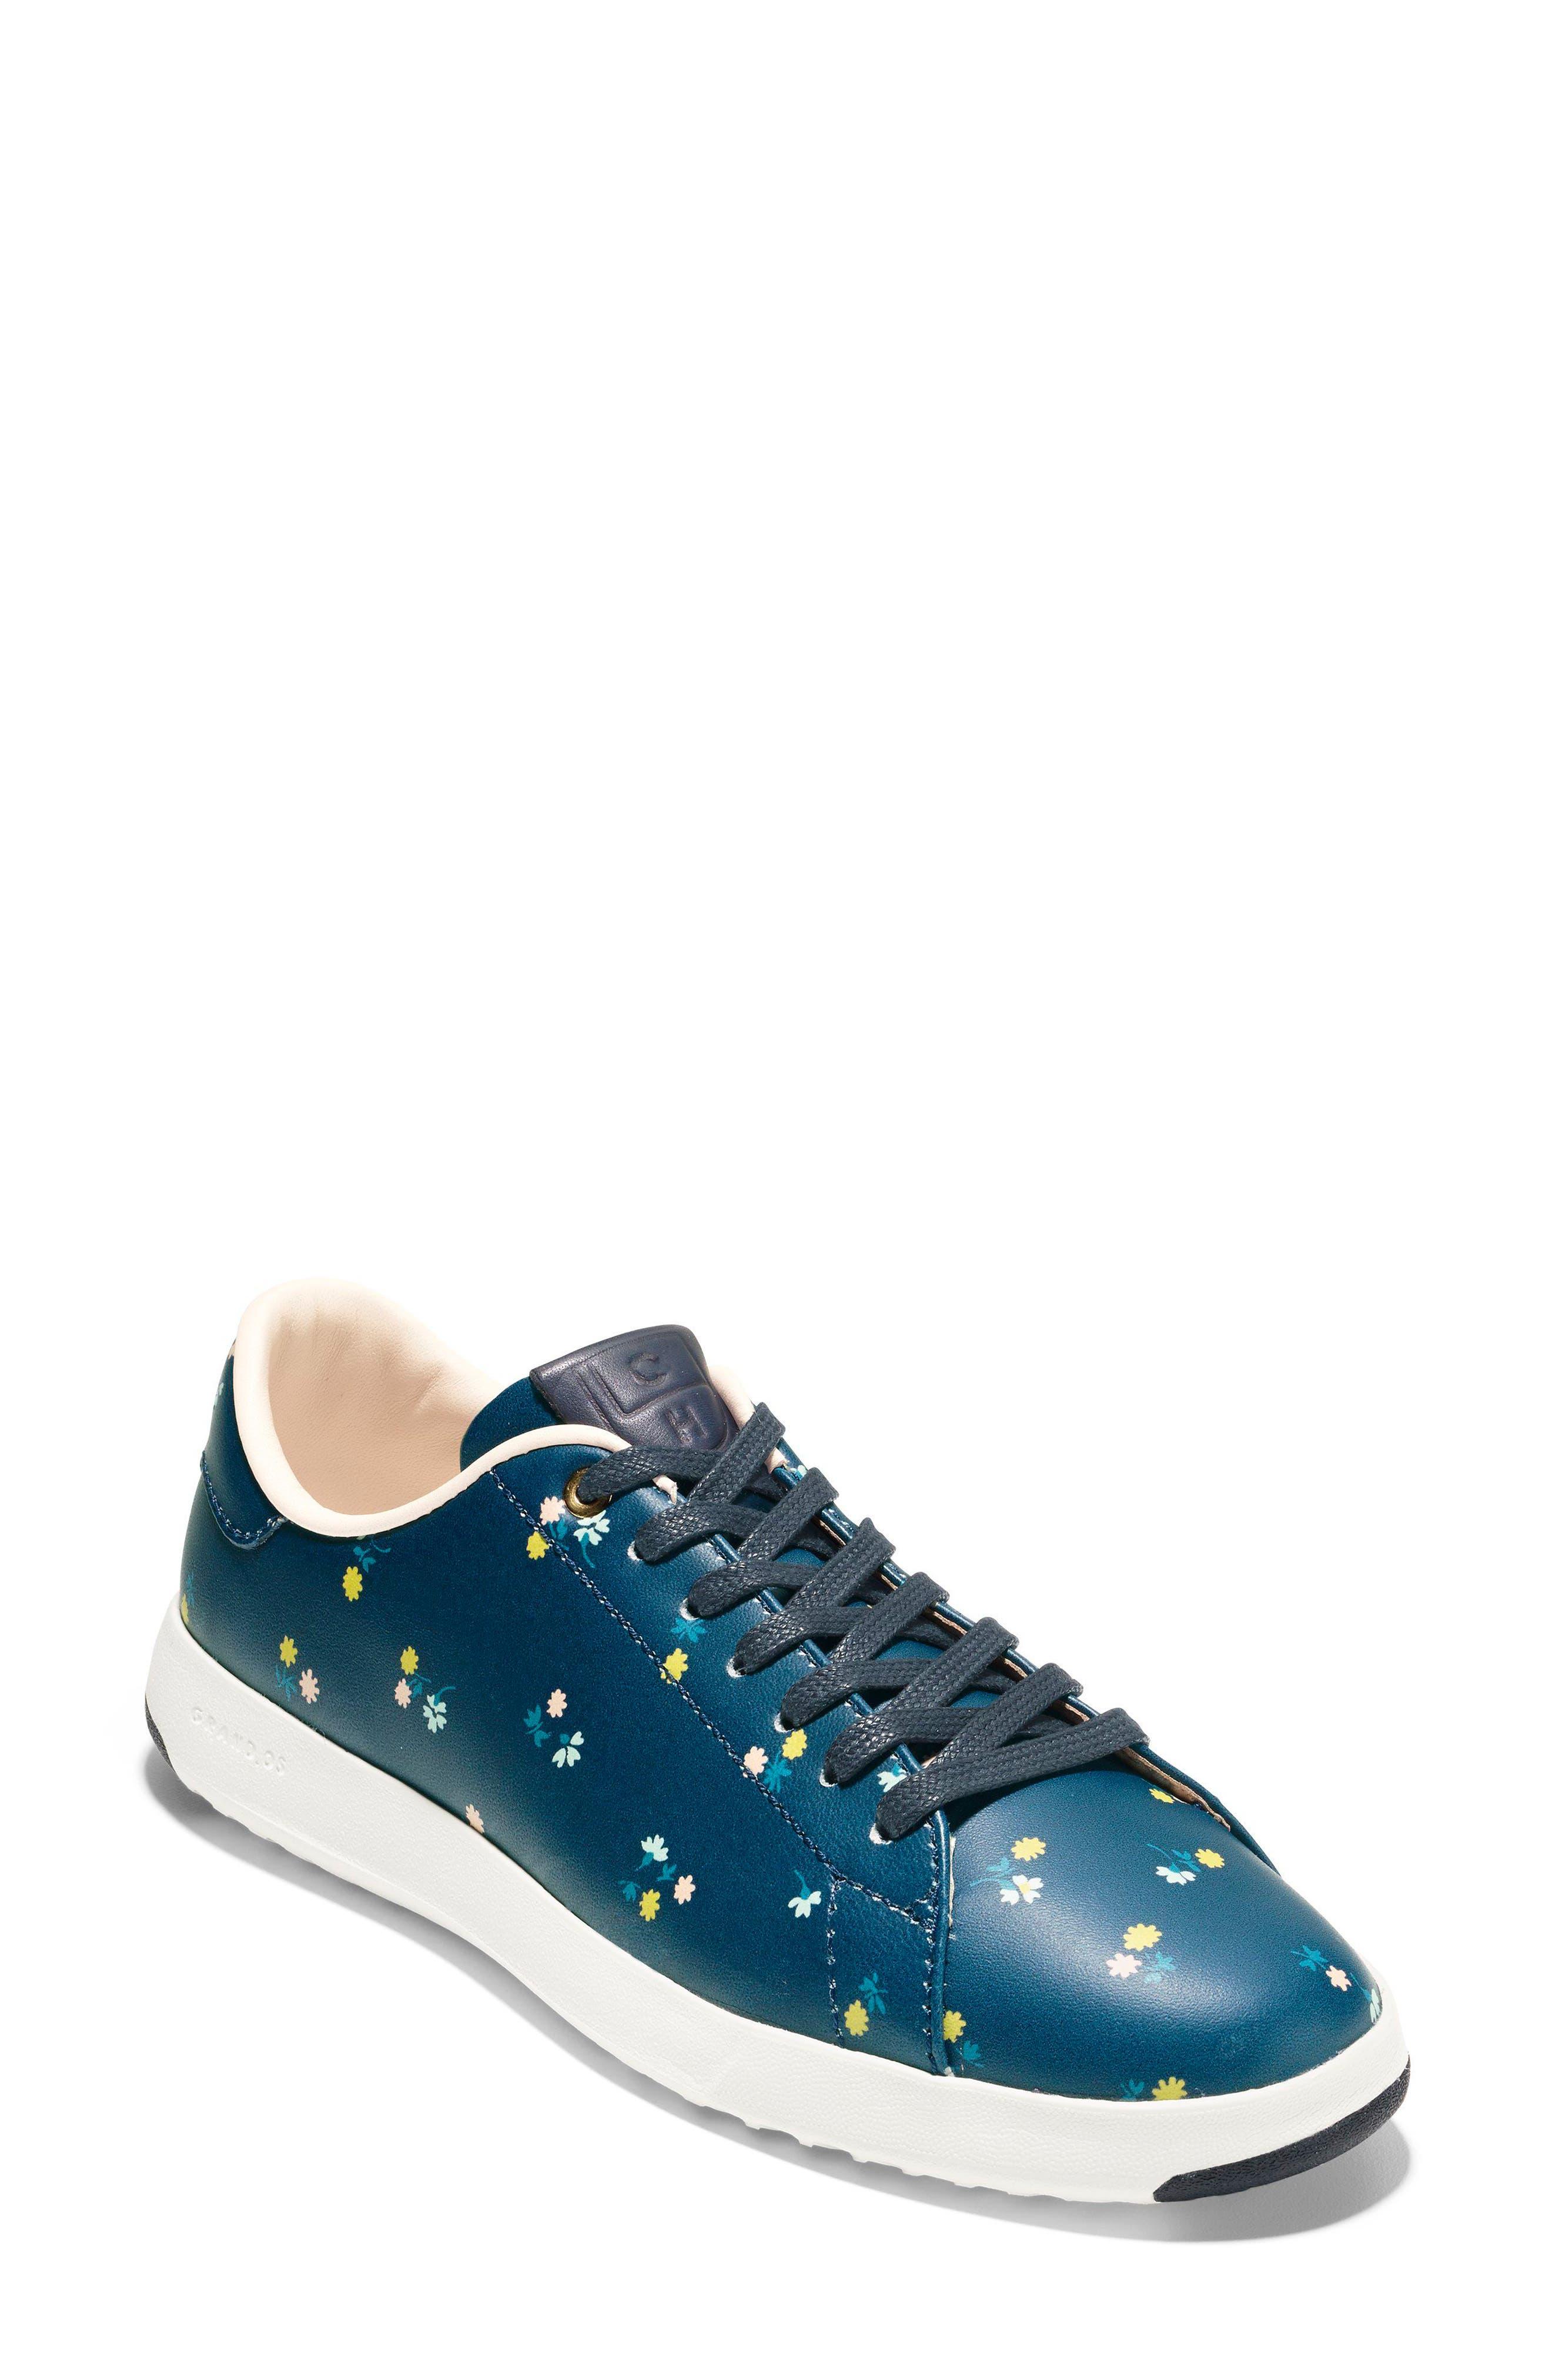 GrandPro Tennis Shoe,                         Main,                         color, NAVY FLORAL LEATHER